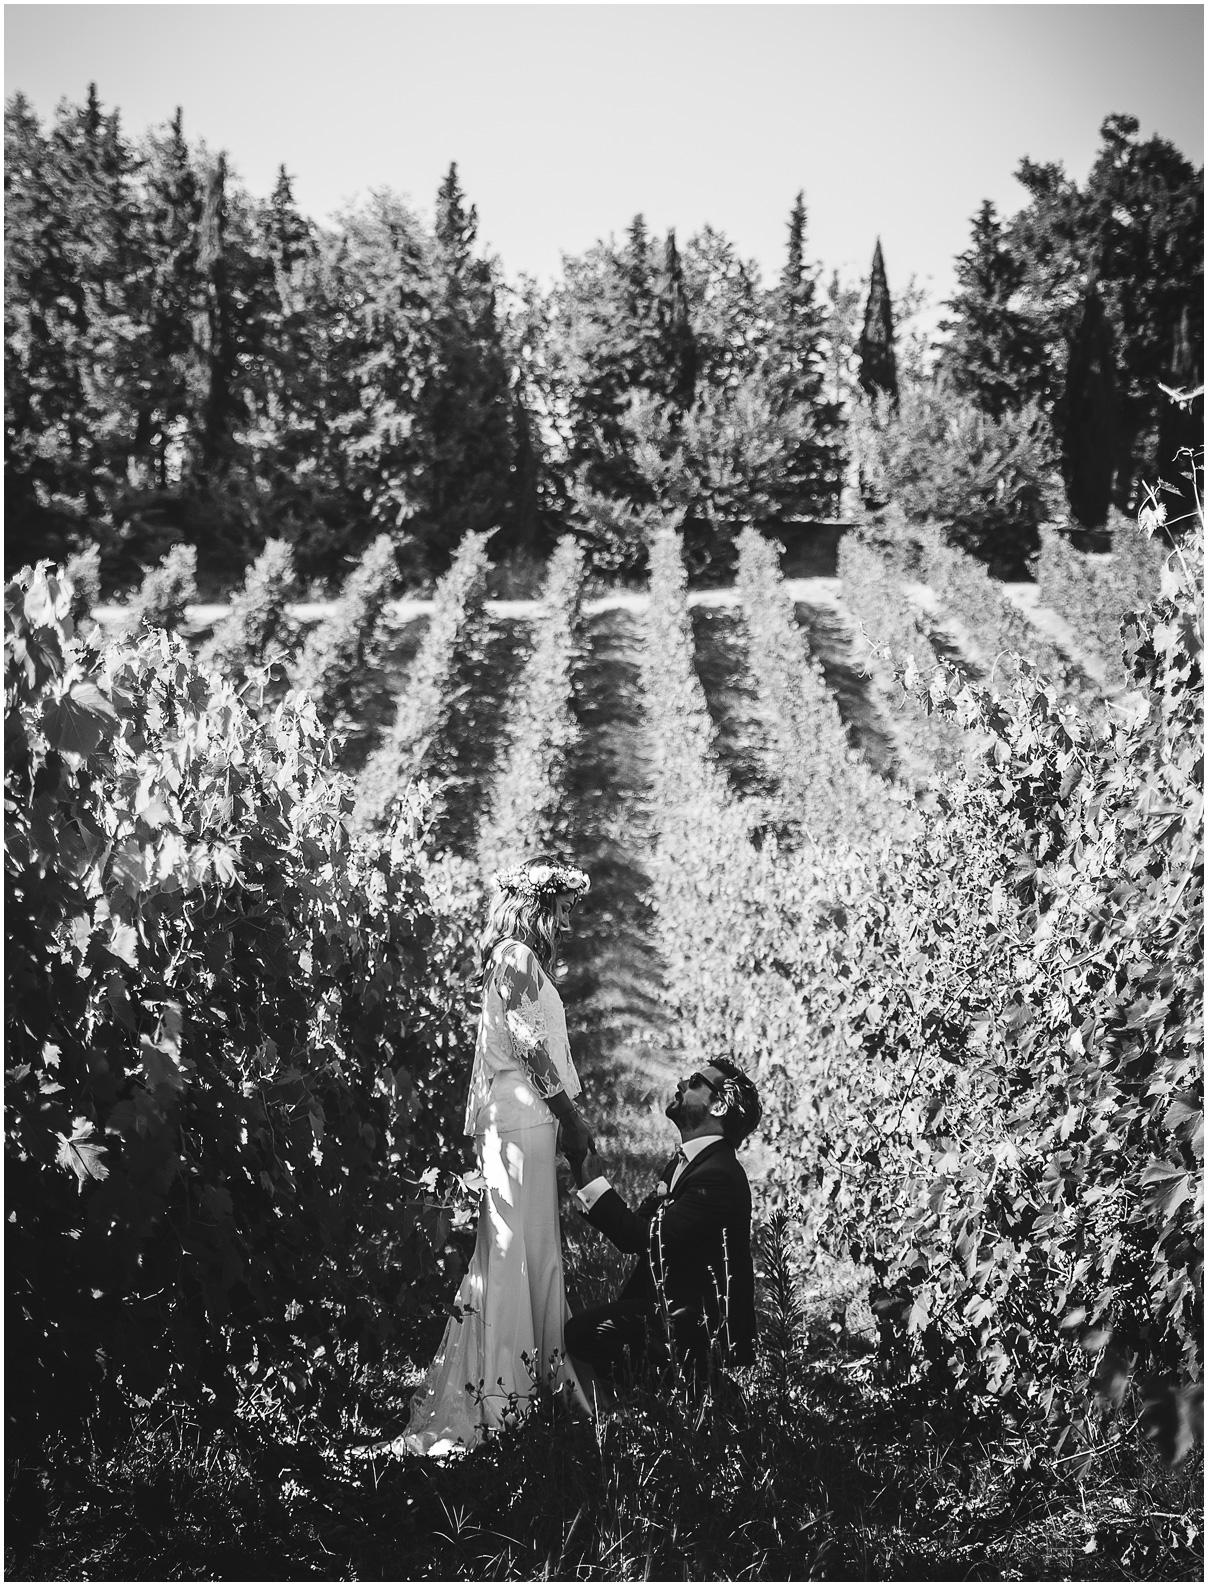 wedding-photography-charlotte-laurent-sara-lorenzoni-matrimonio-arezzo-tuscany-castello-il-palagio-33